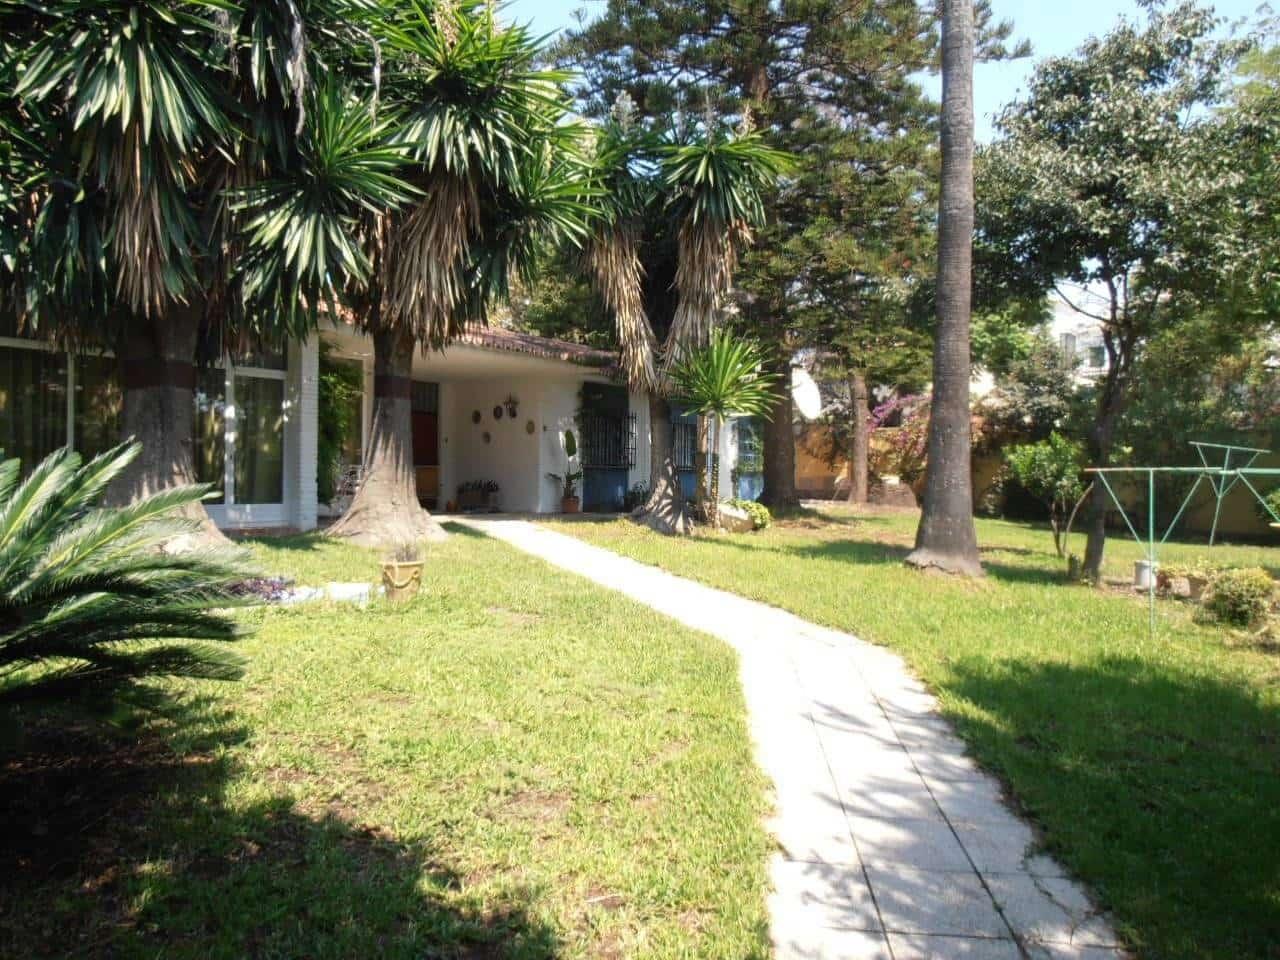 4 bedroom Villa for sale in Benalmadena with garage - € 500,000 (Ref: 4529874)